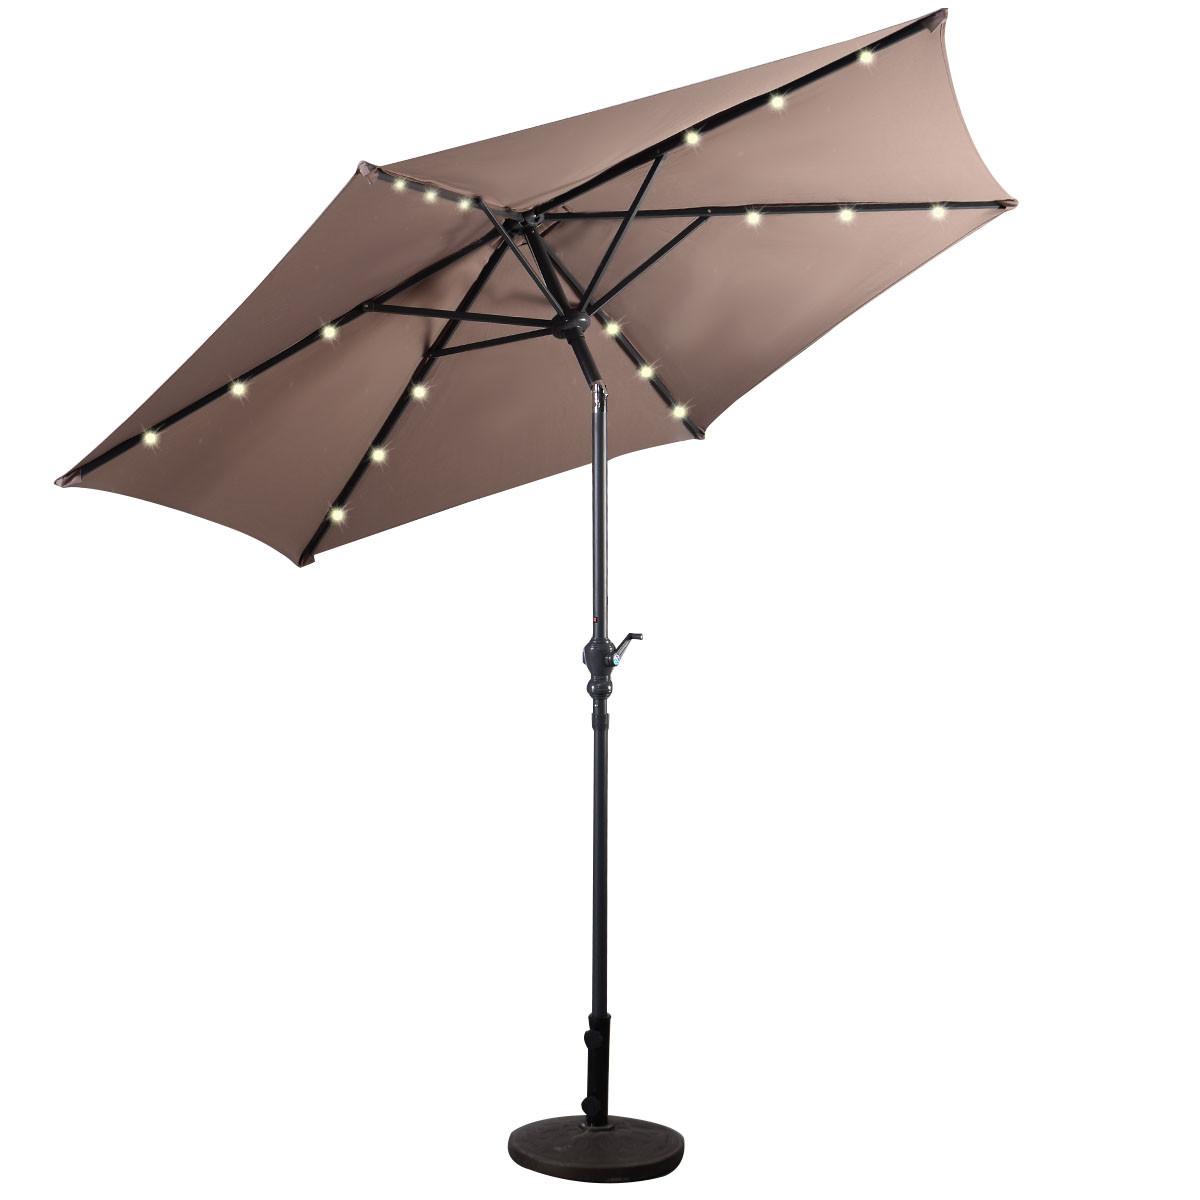 Best ideas about Patio Umbrella Walmart . Save or Pin Trademark Innovations 10 x 6 5 Rectangular Solar Powered Now.